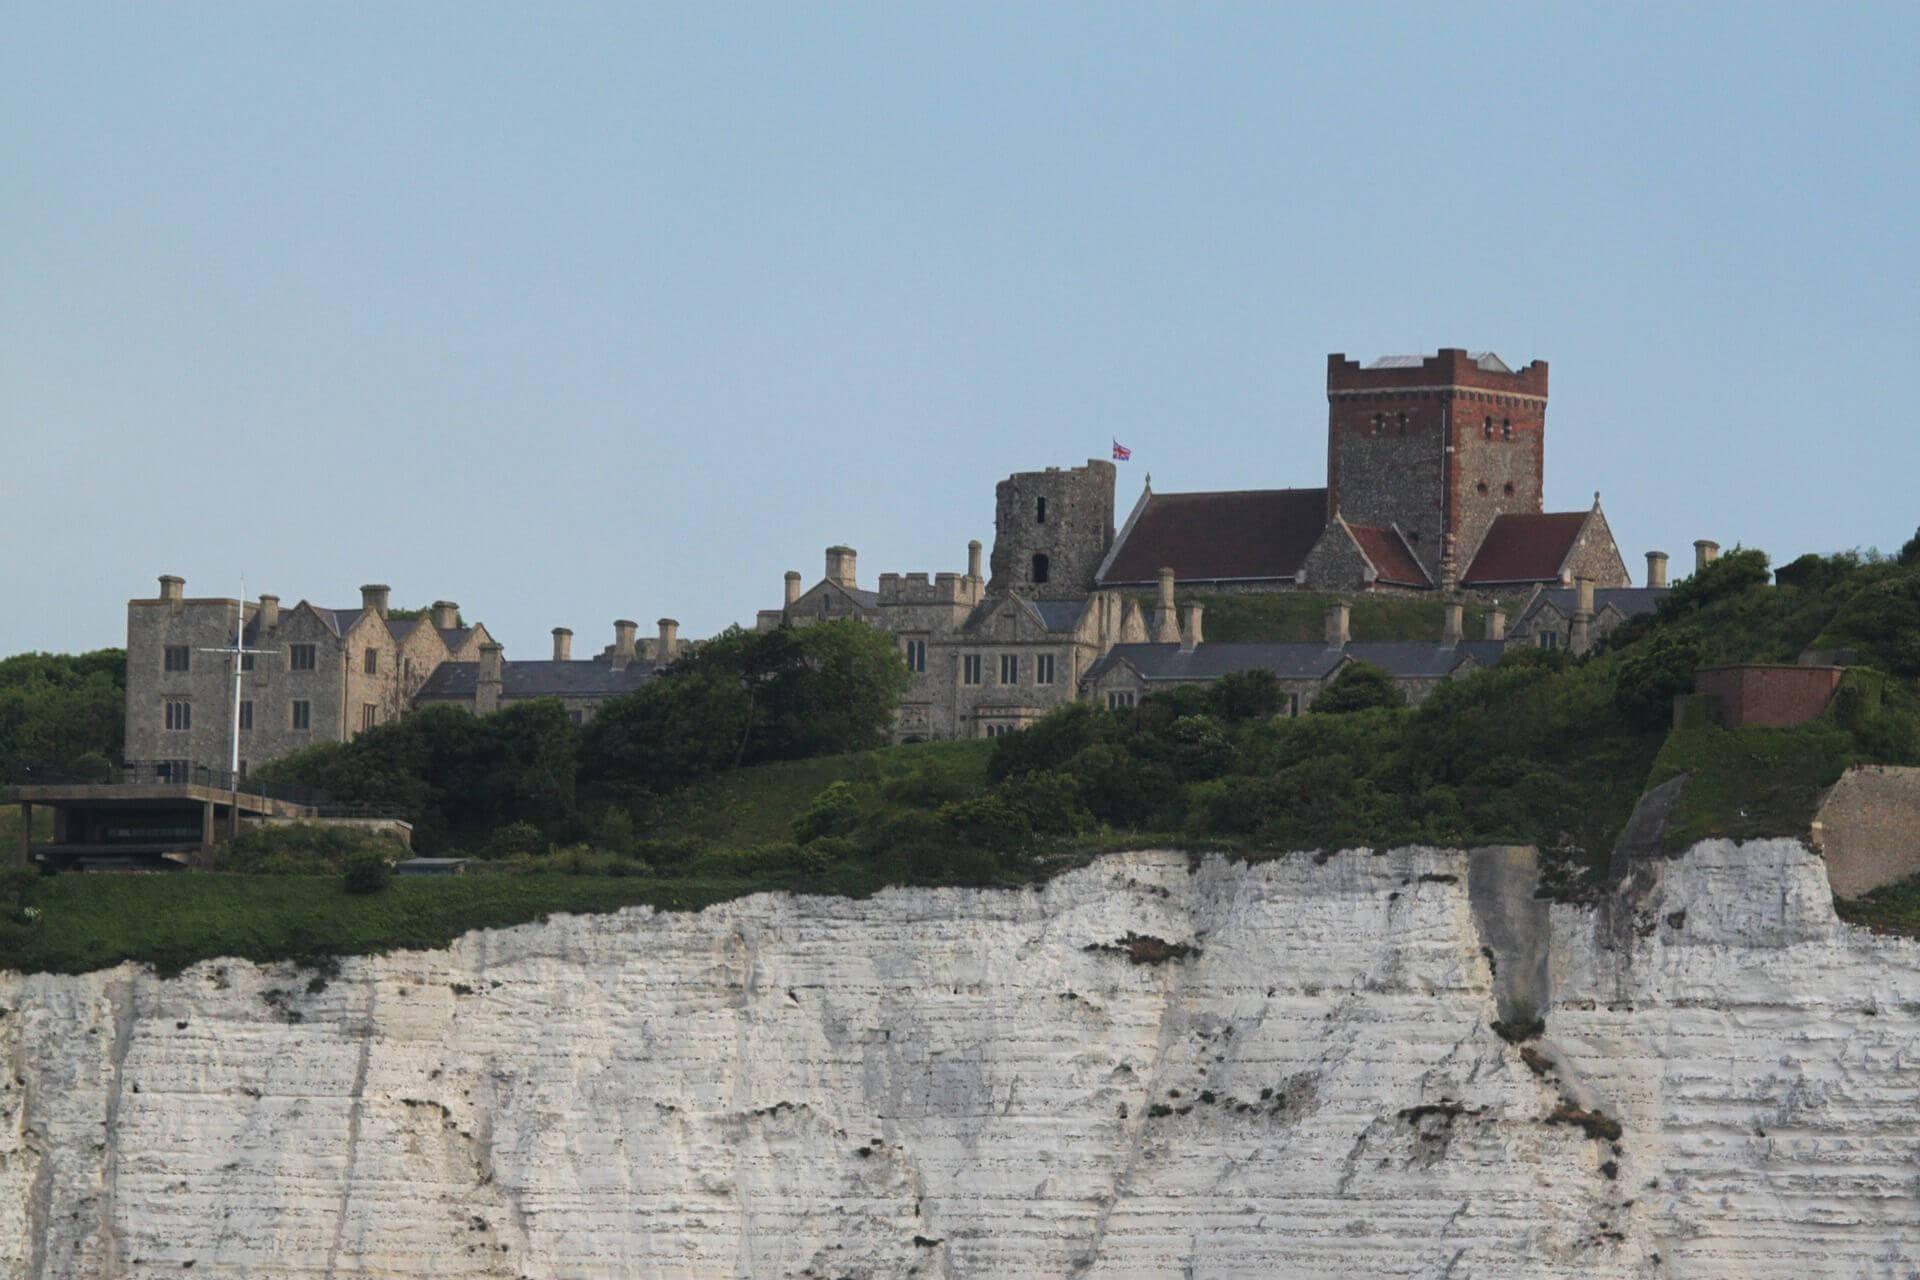 kasteel white cliffs dover